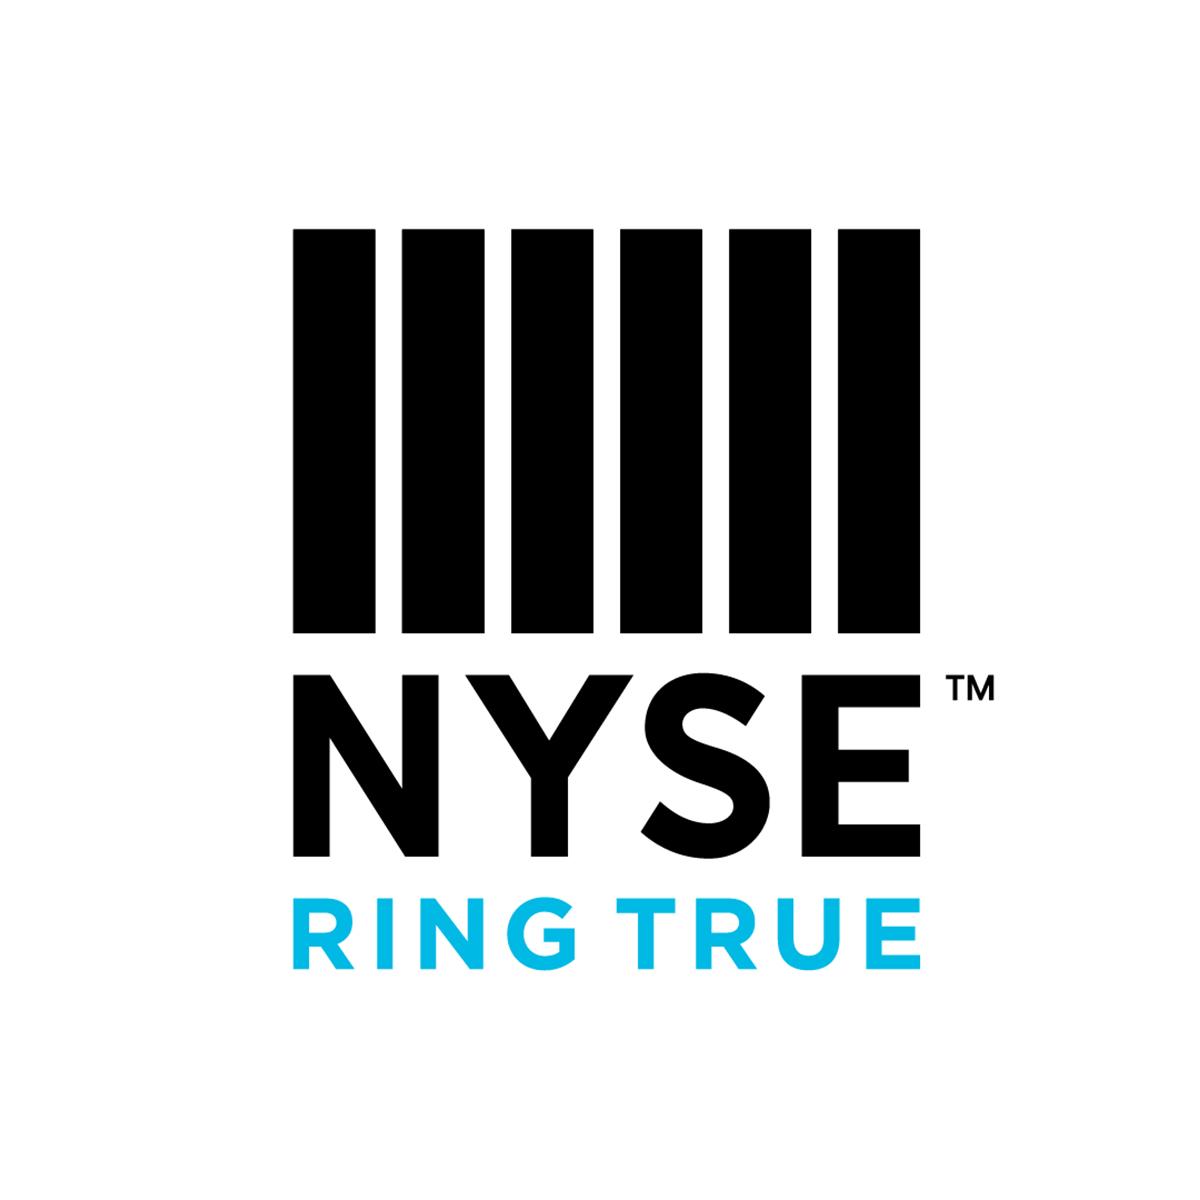 A-NYSE.jpg